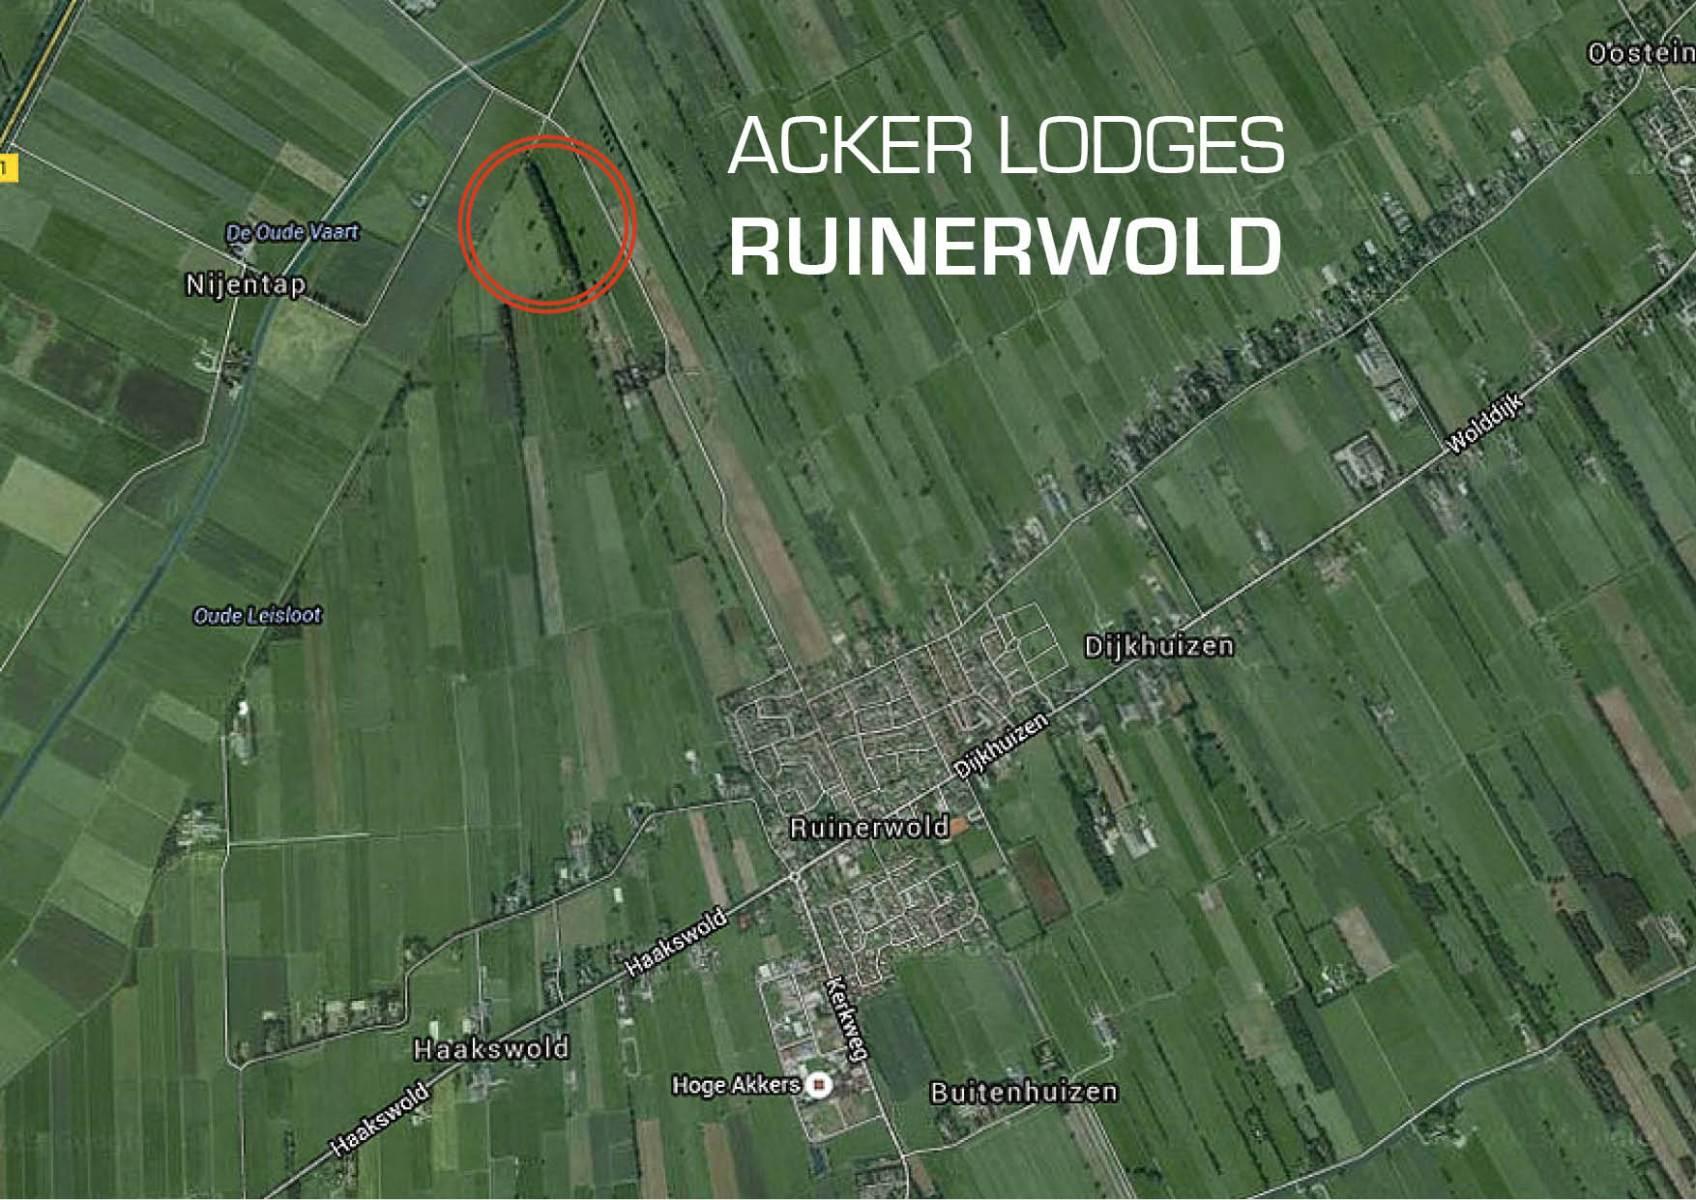 Acker-Lodges-Ruinerwold-Conceptstudie